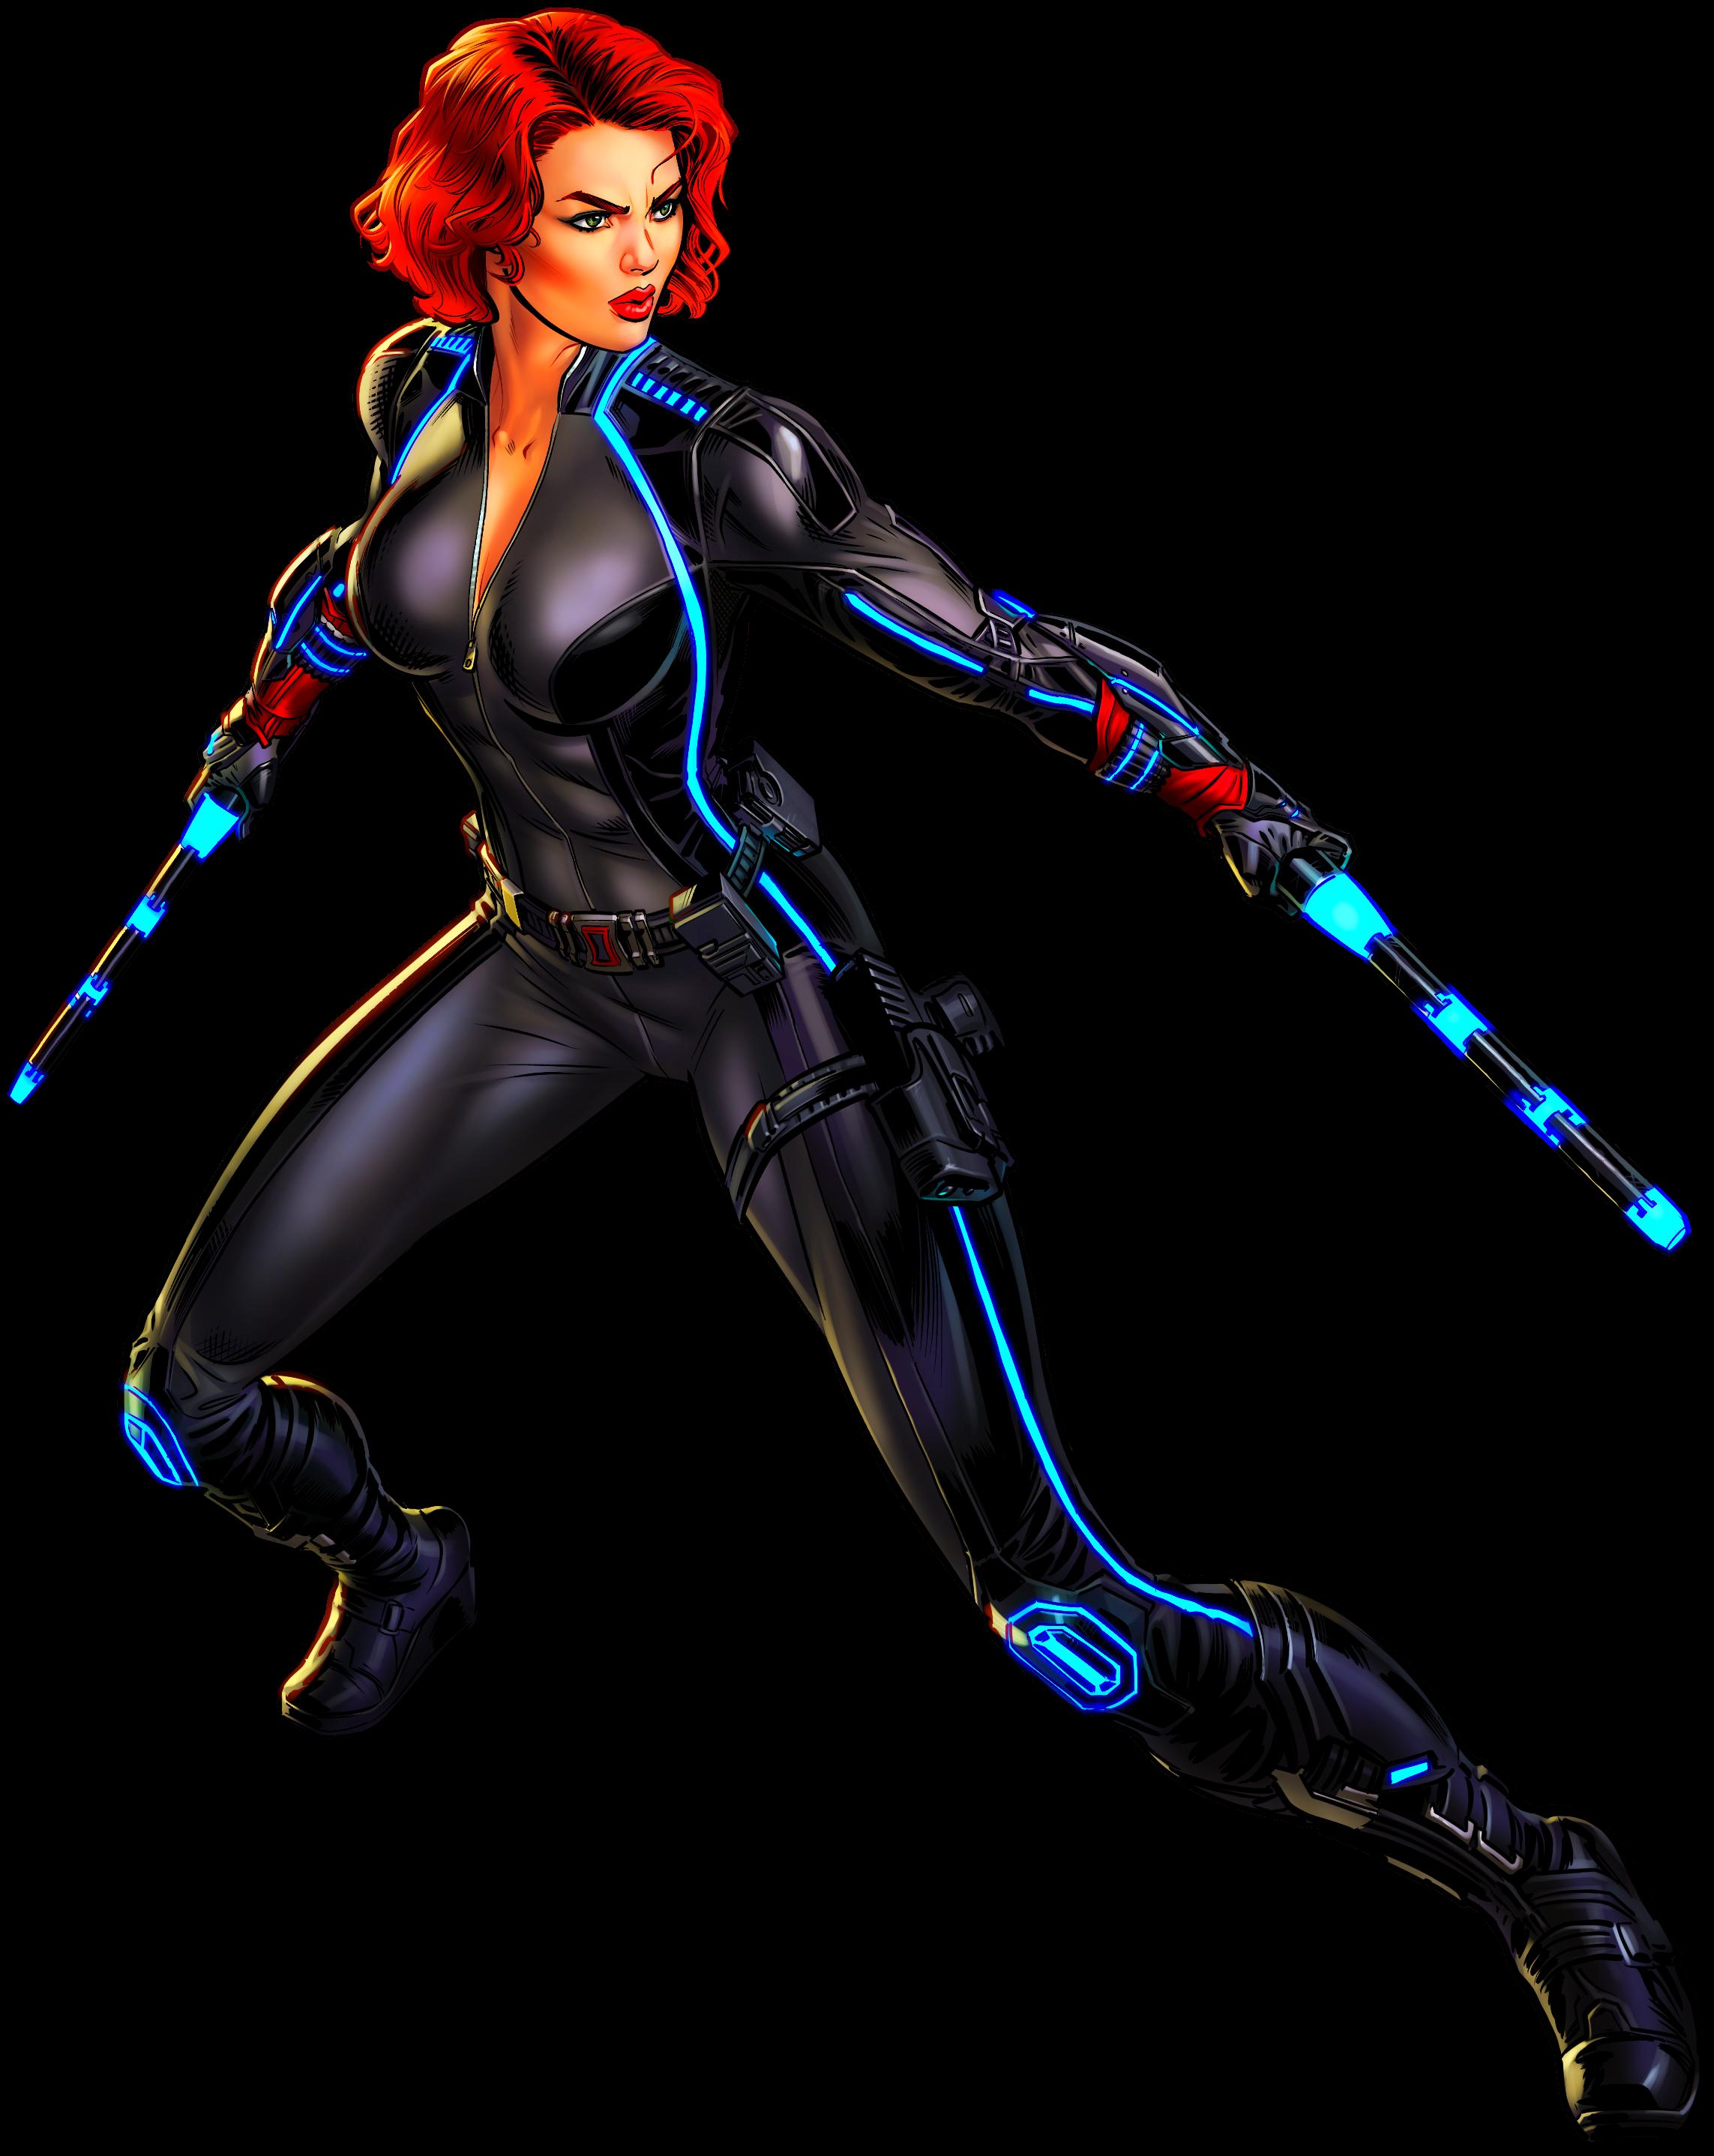 Black Widow AoU by AlexelZ on DeviantArt